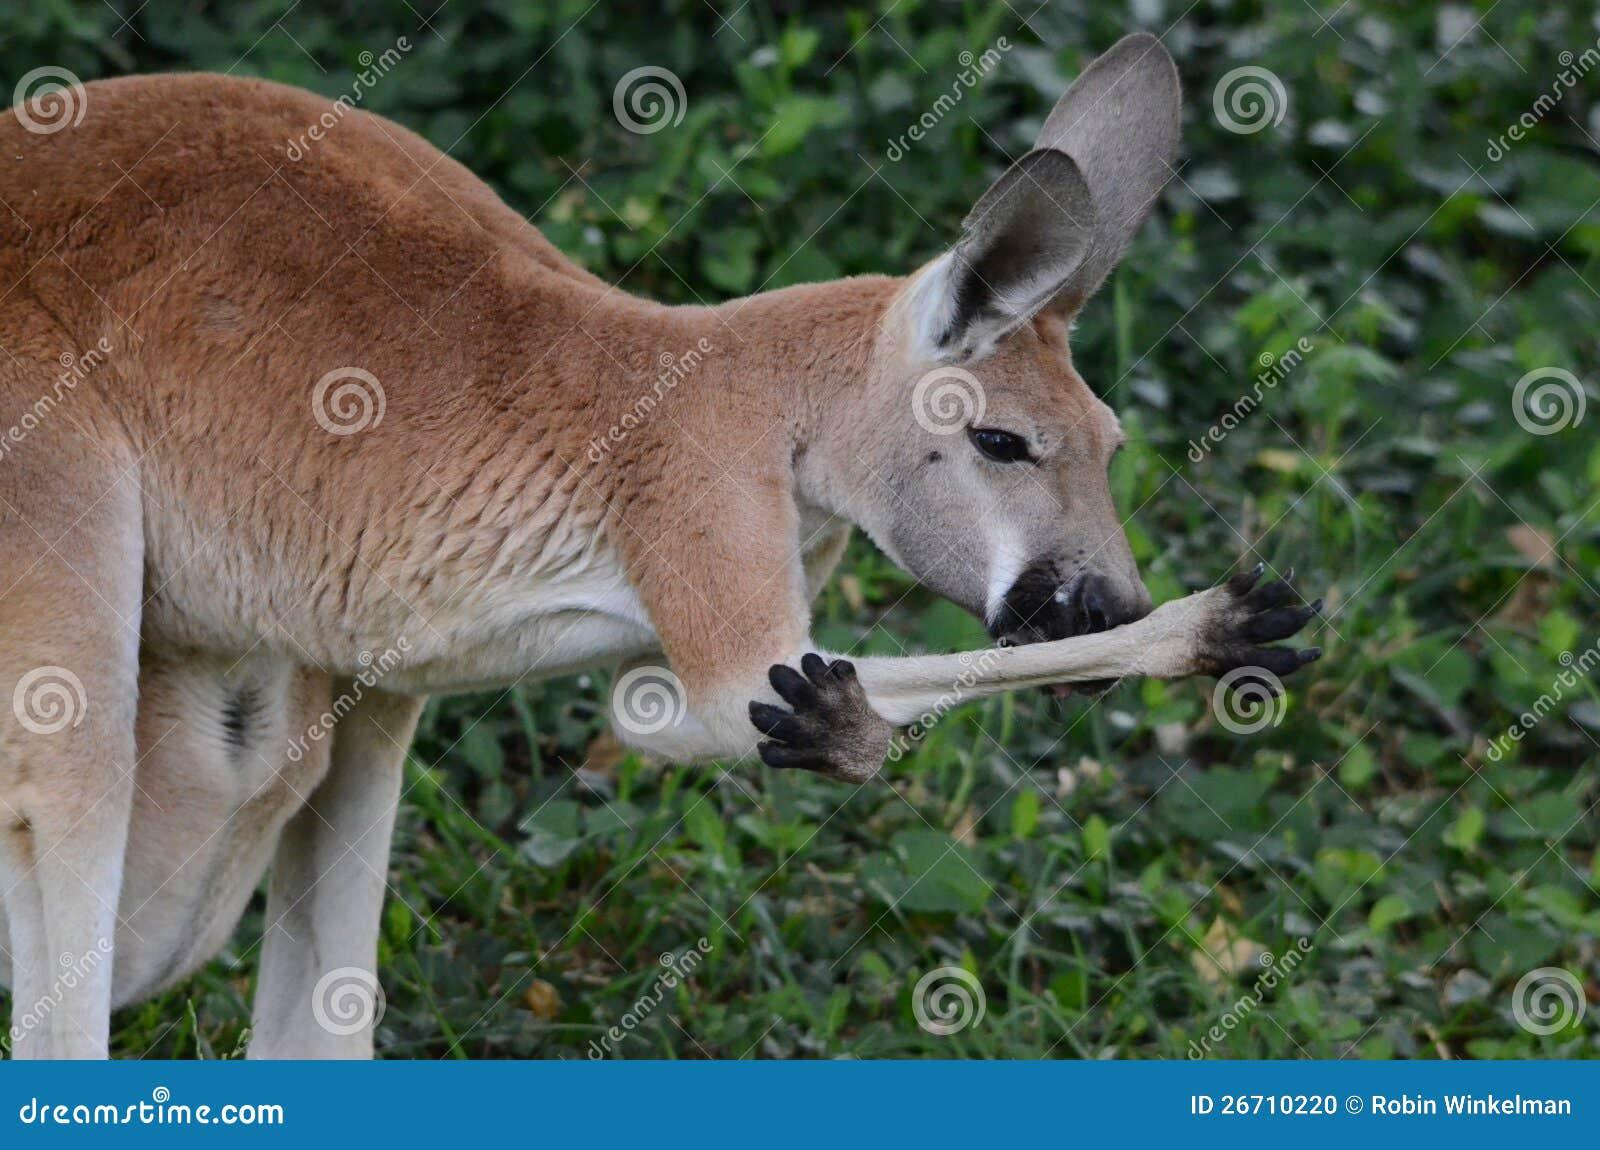 Rouge femelle kangaroo2